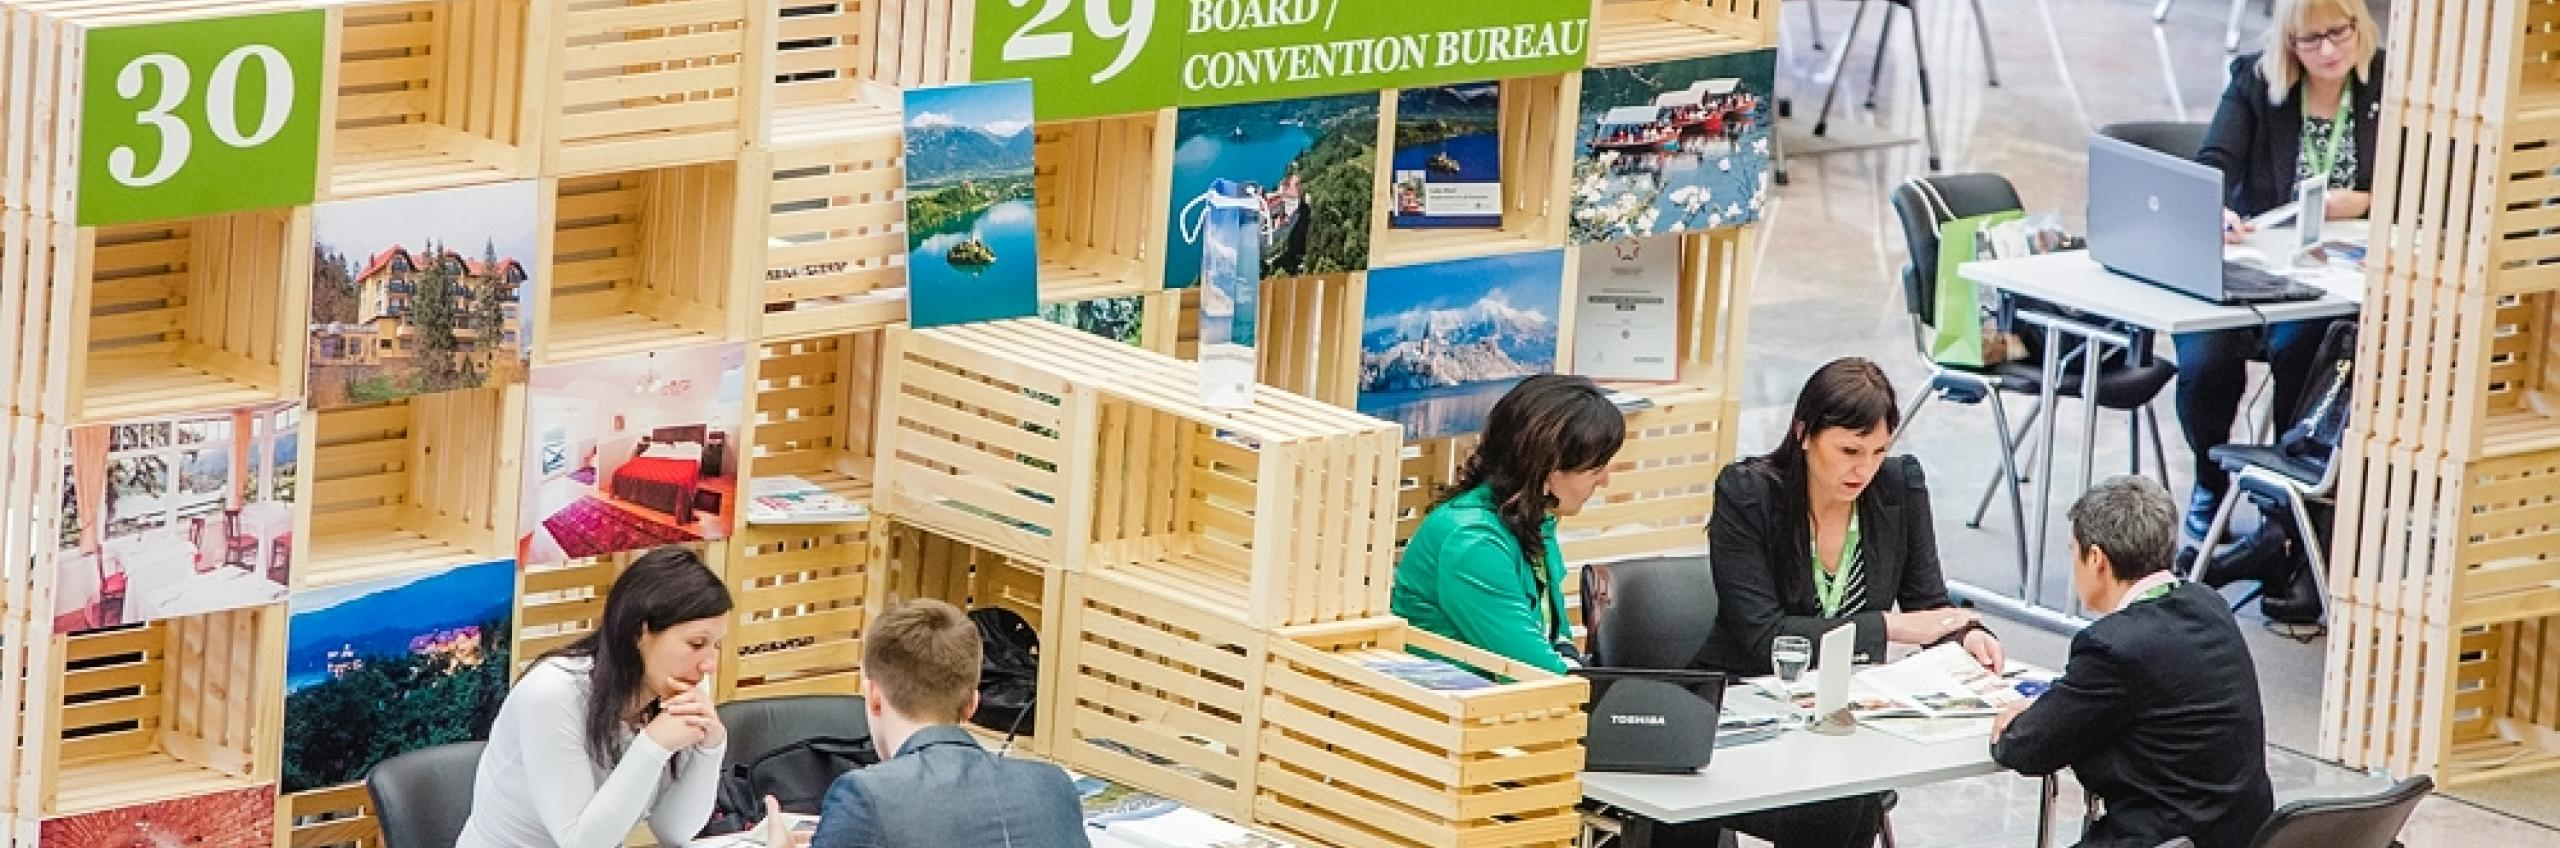 Conventa Fair in Slovenia